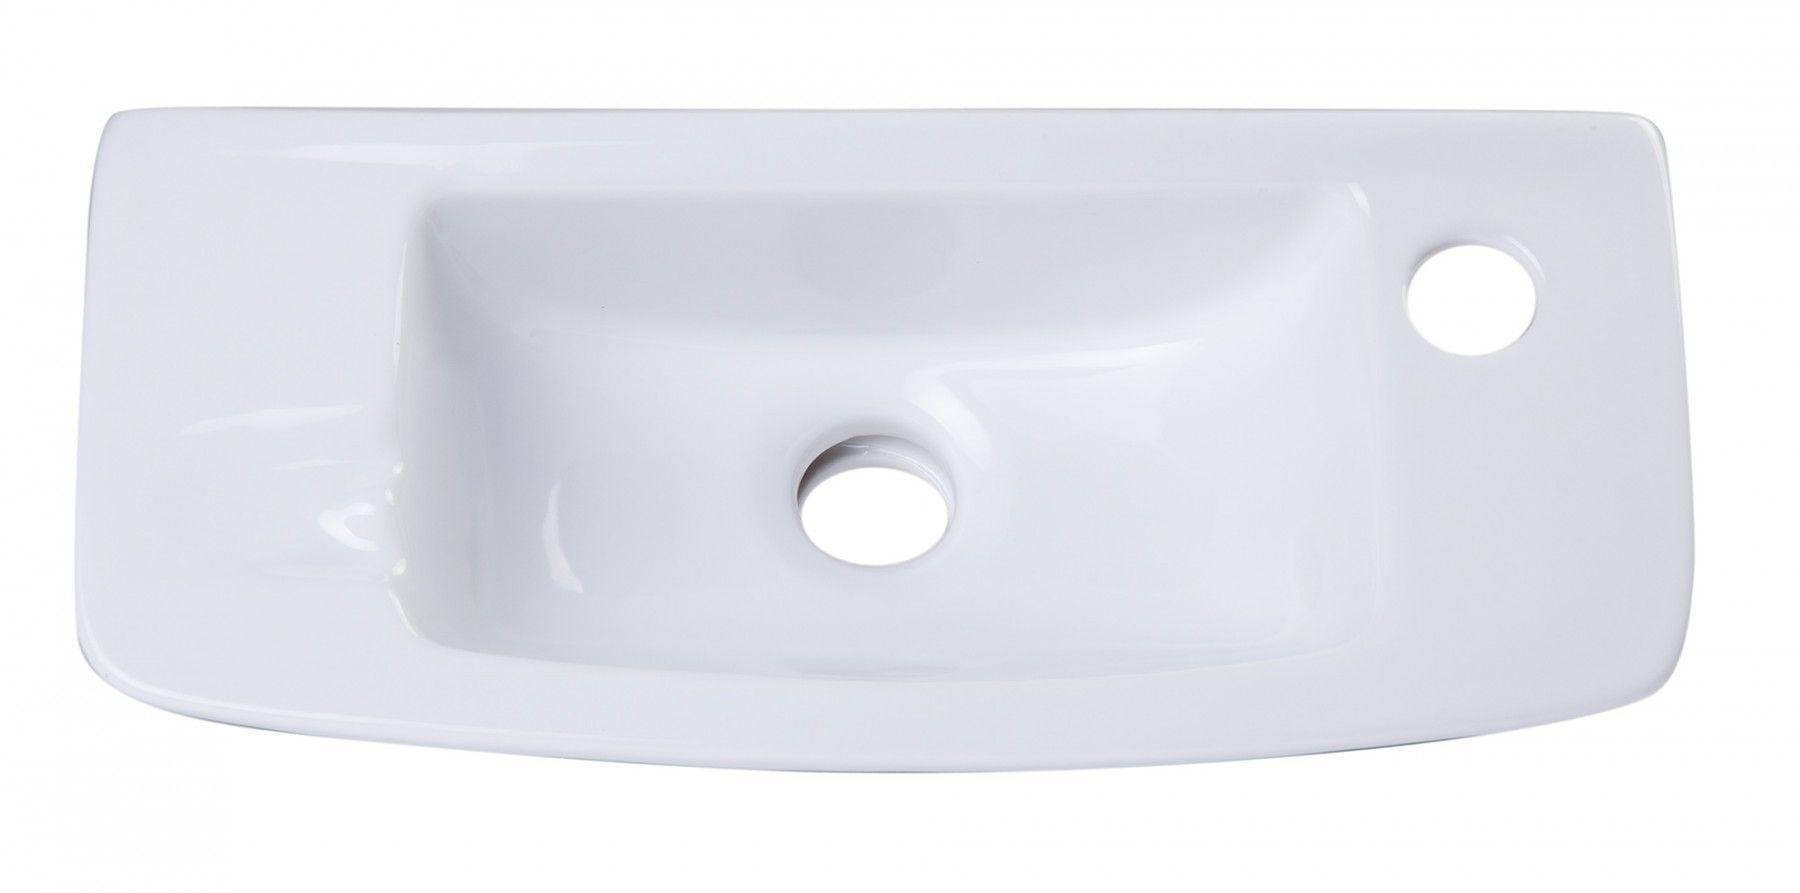 ALFI brand AB103 Small White Porcelain Wall Mount Bathroom Sink Basin